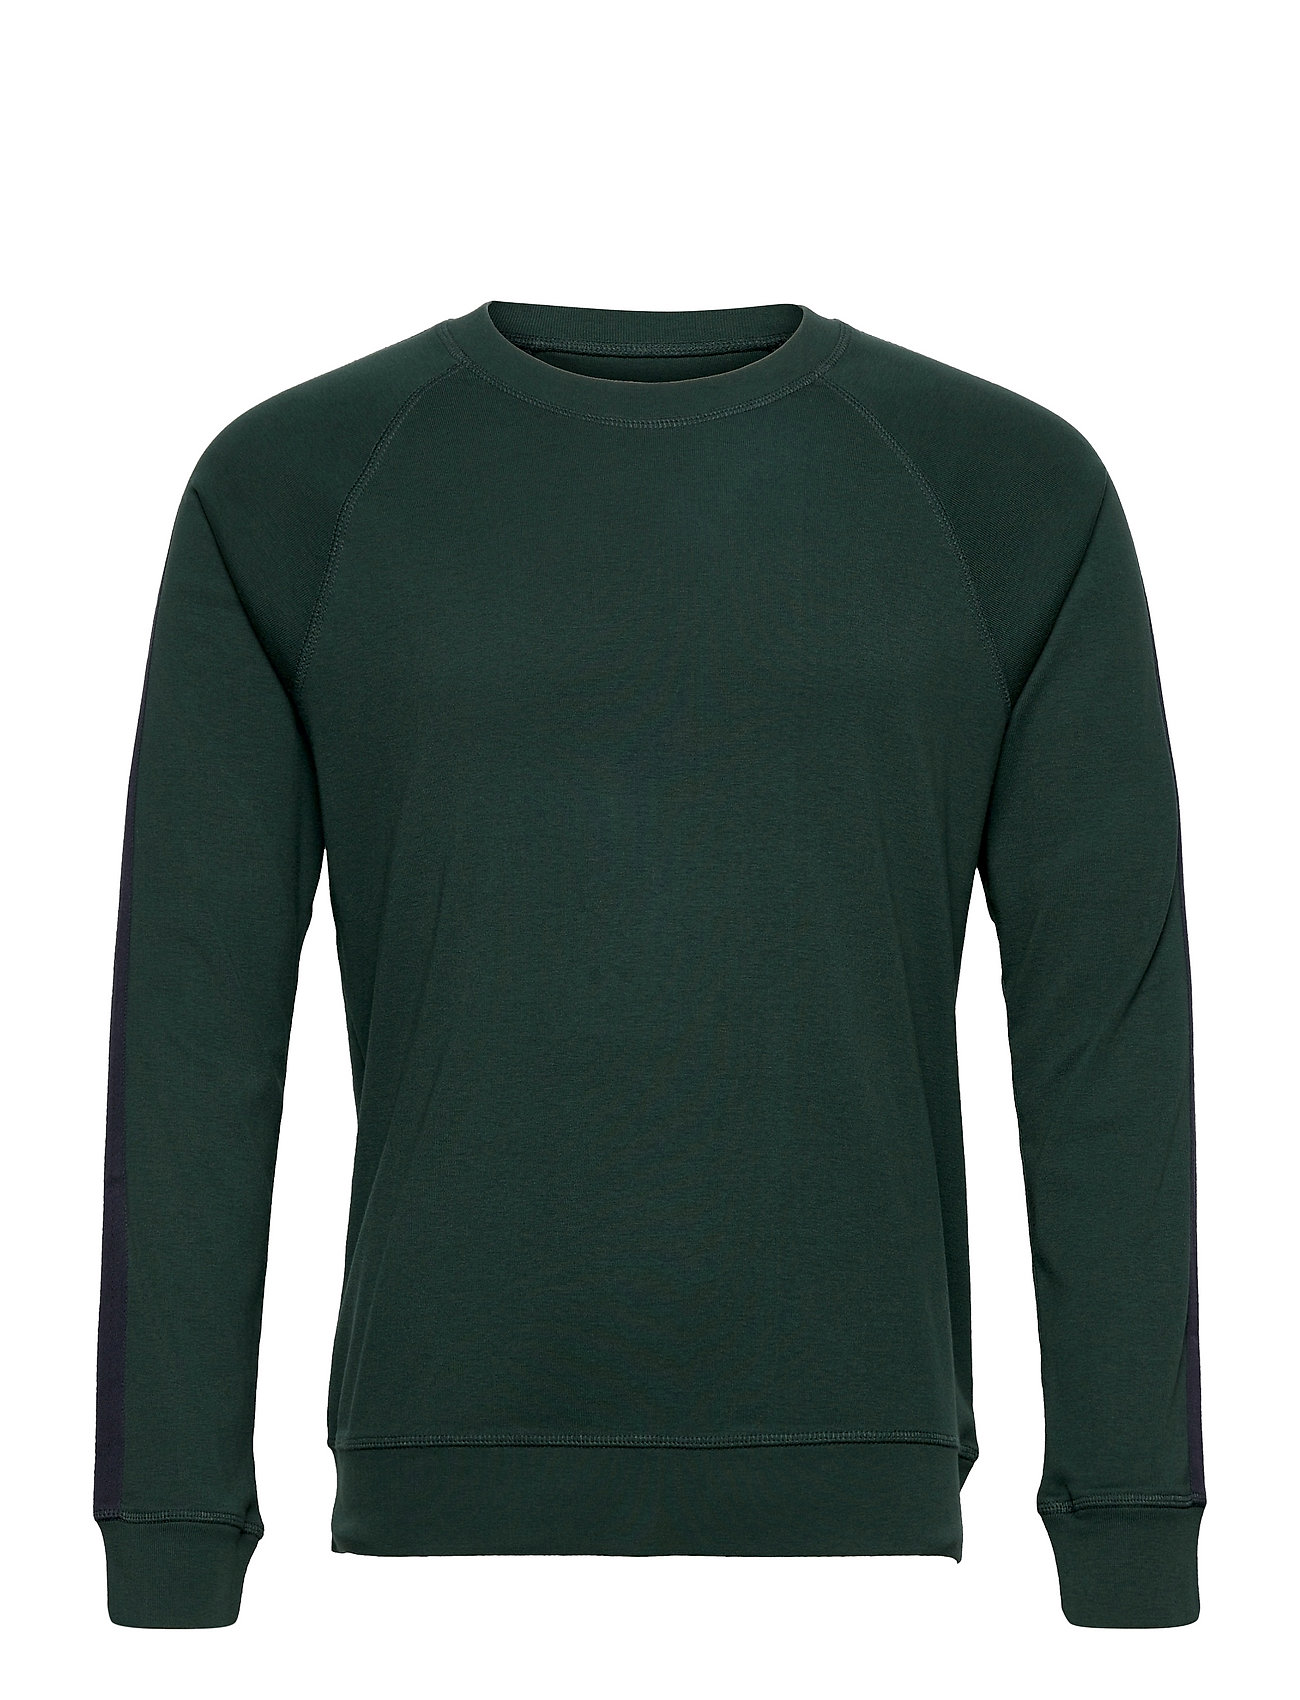 Cotton Rib Stelt Tape Sweatshirt Trøje Grøn Mads Nørgaard